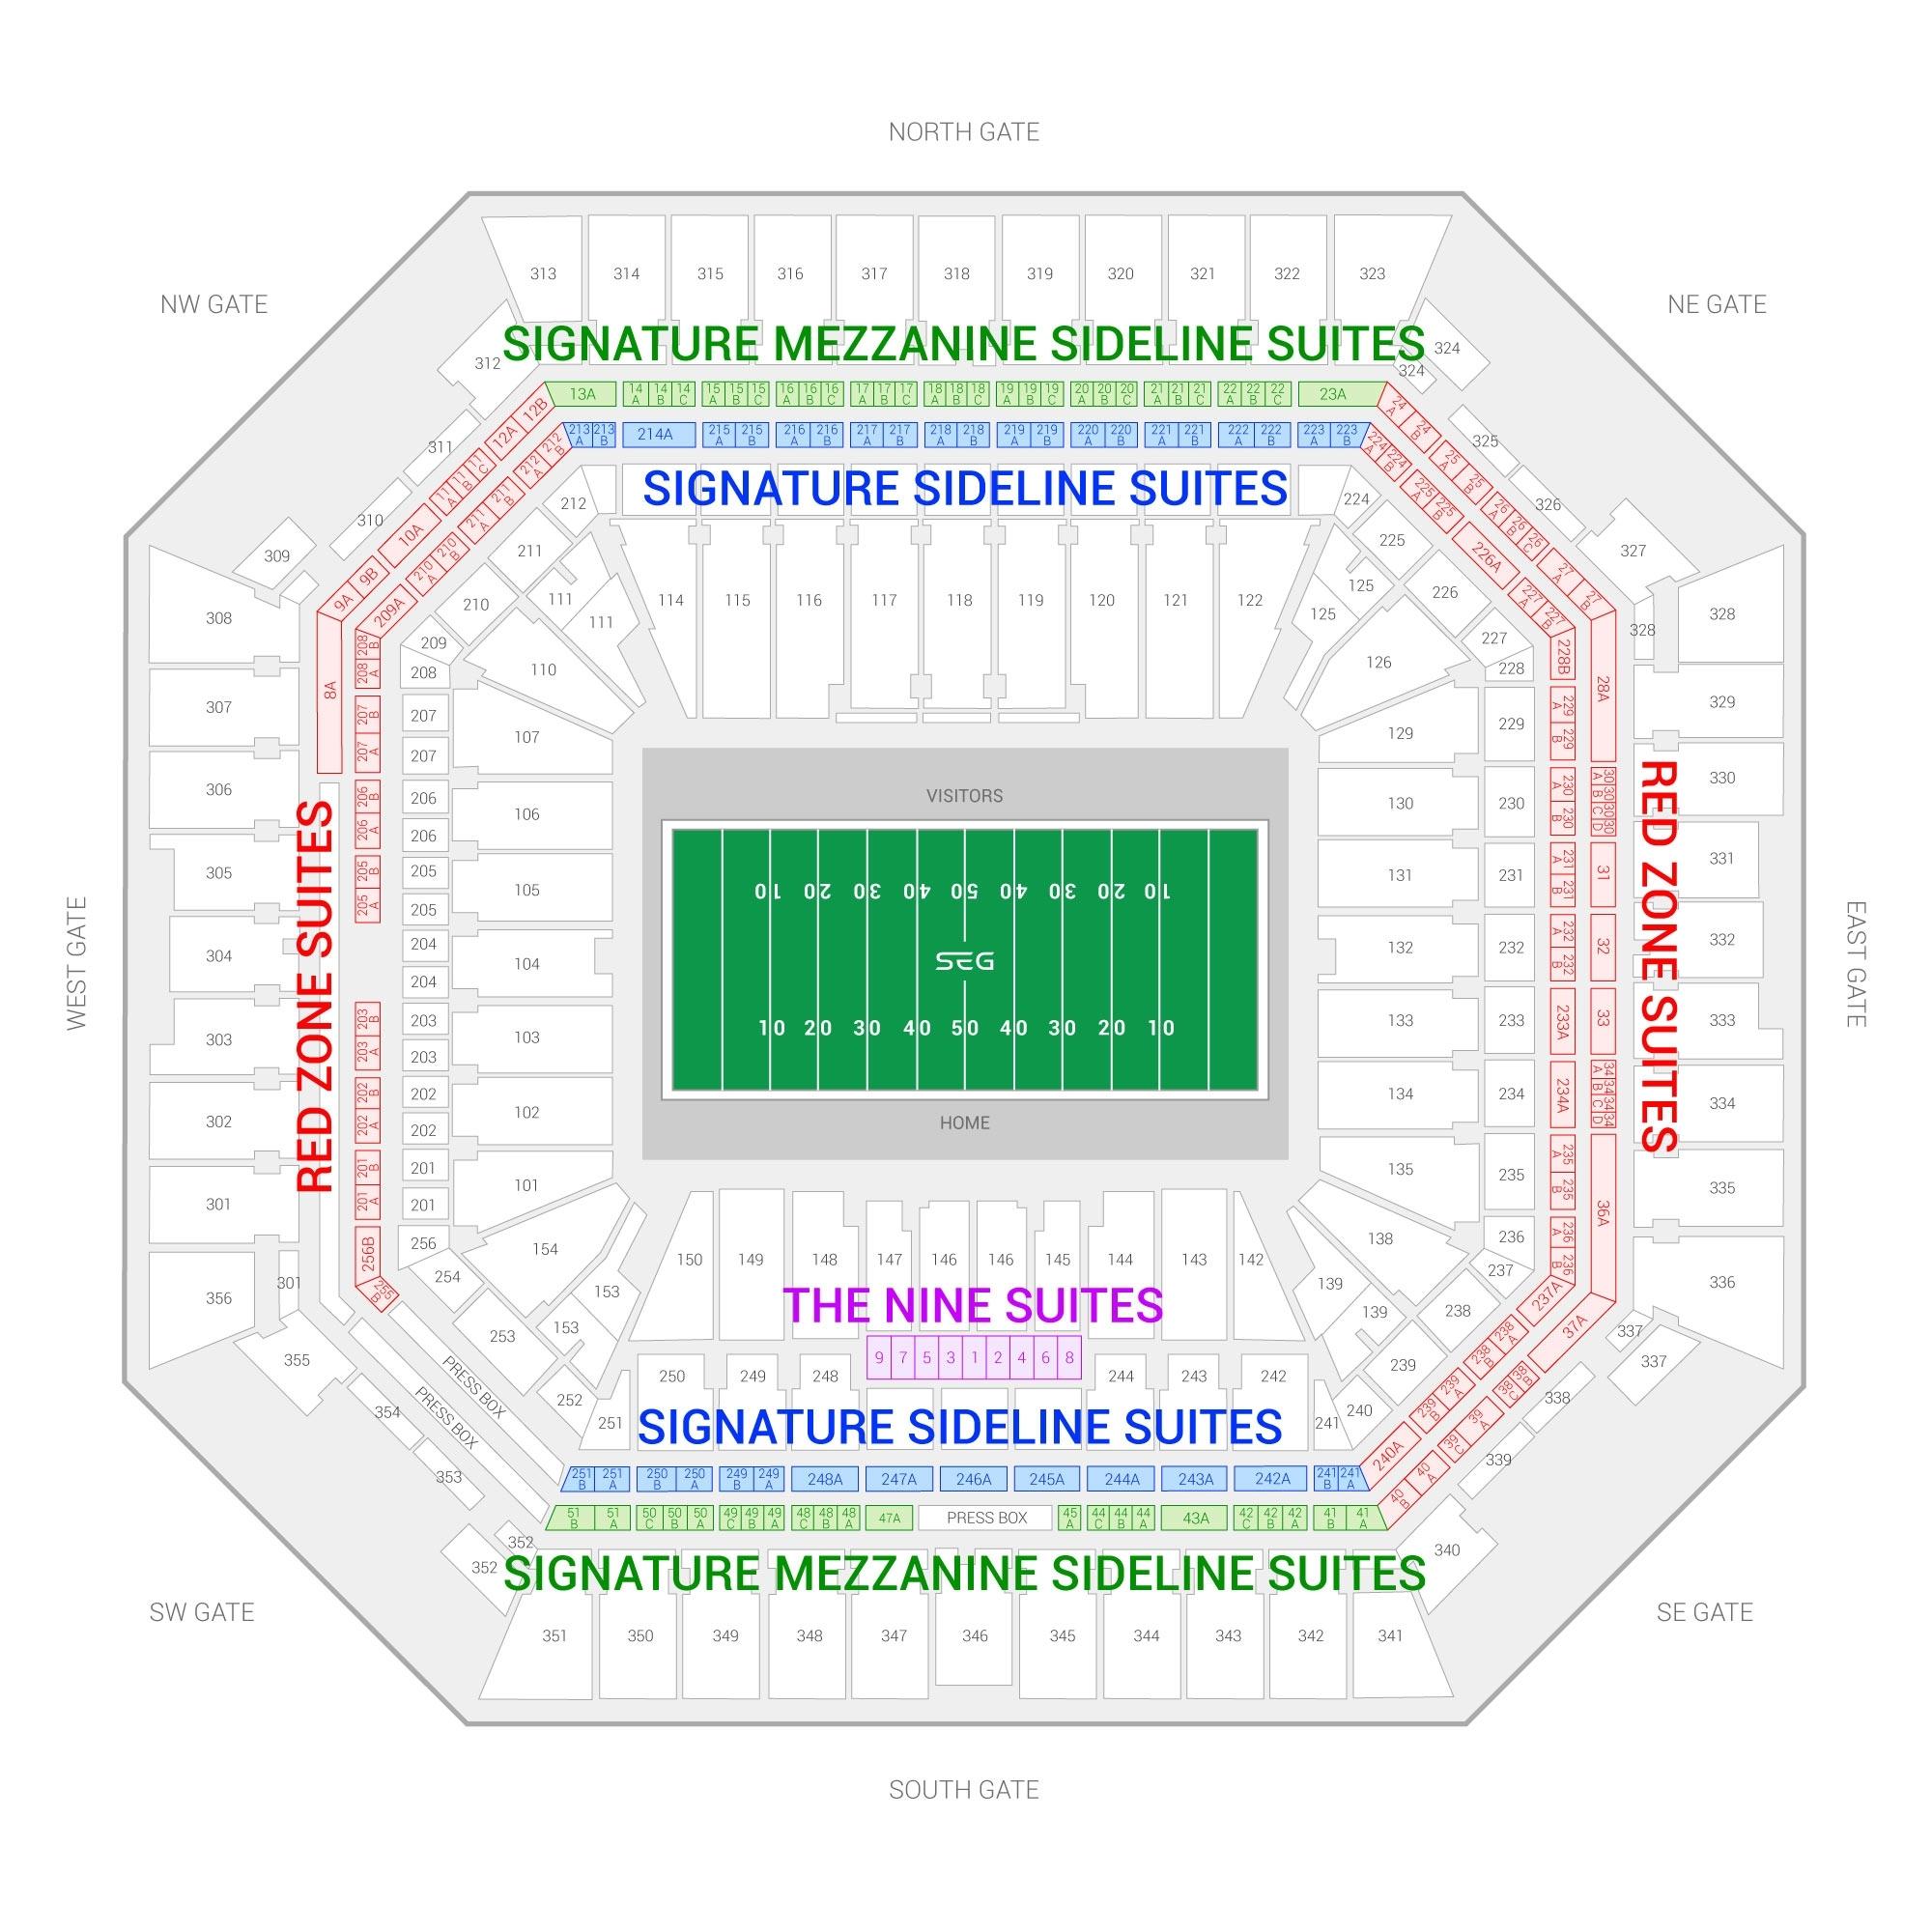 Super Bowl Liv Suite Rentals | Hard Rock Stadium intended for Seating Capacity At Super Bowl